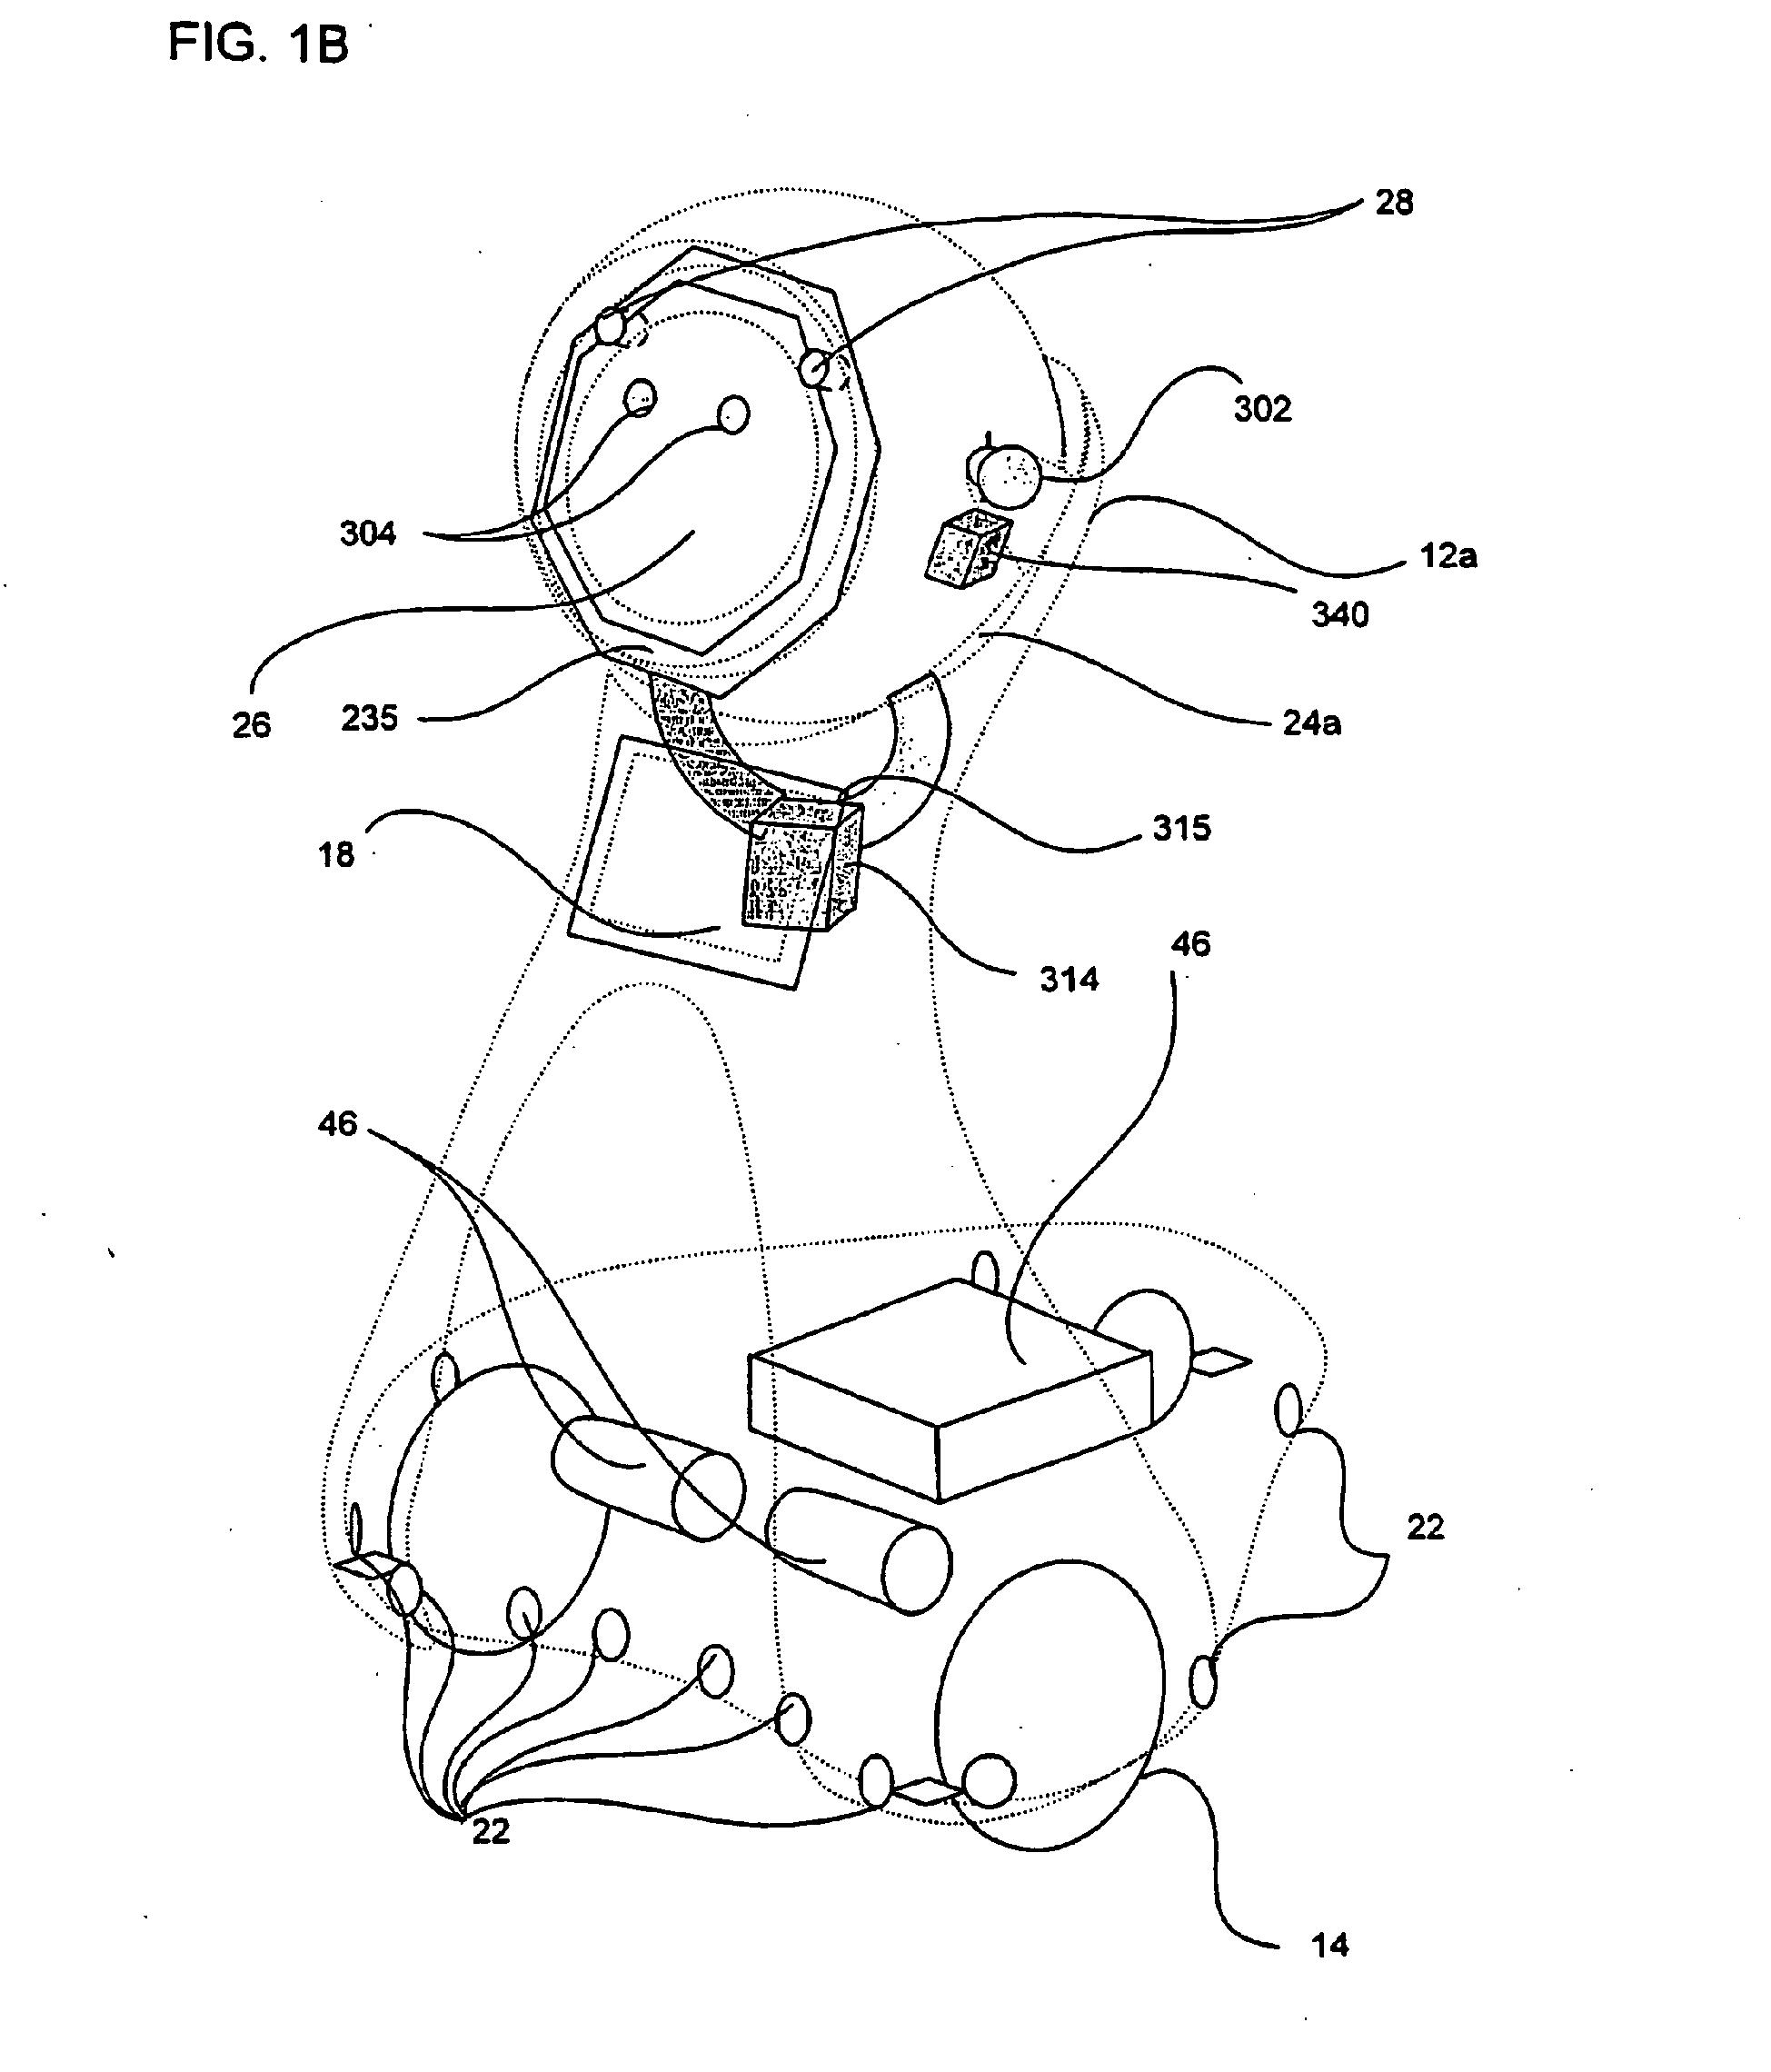 Patent Ep2050544b1 Robotersystem Mit Kabelloser